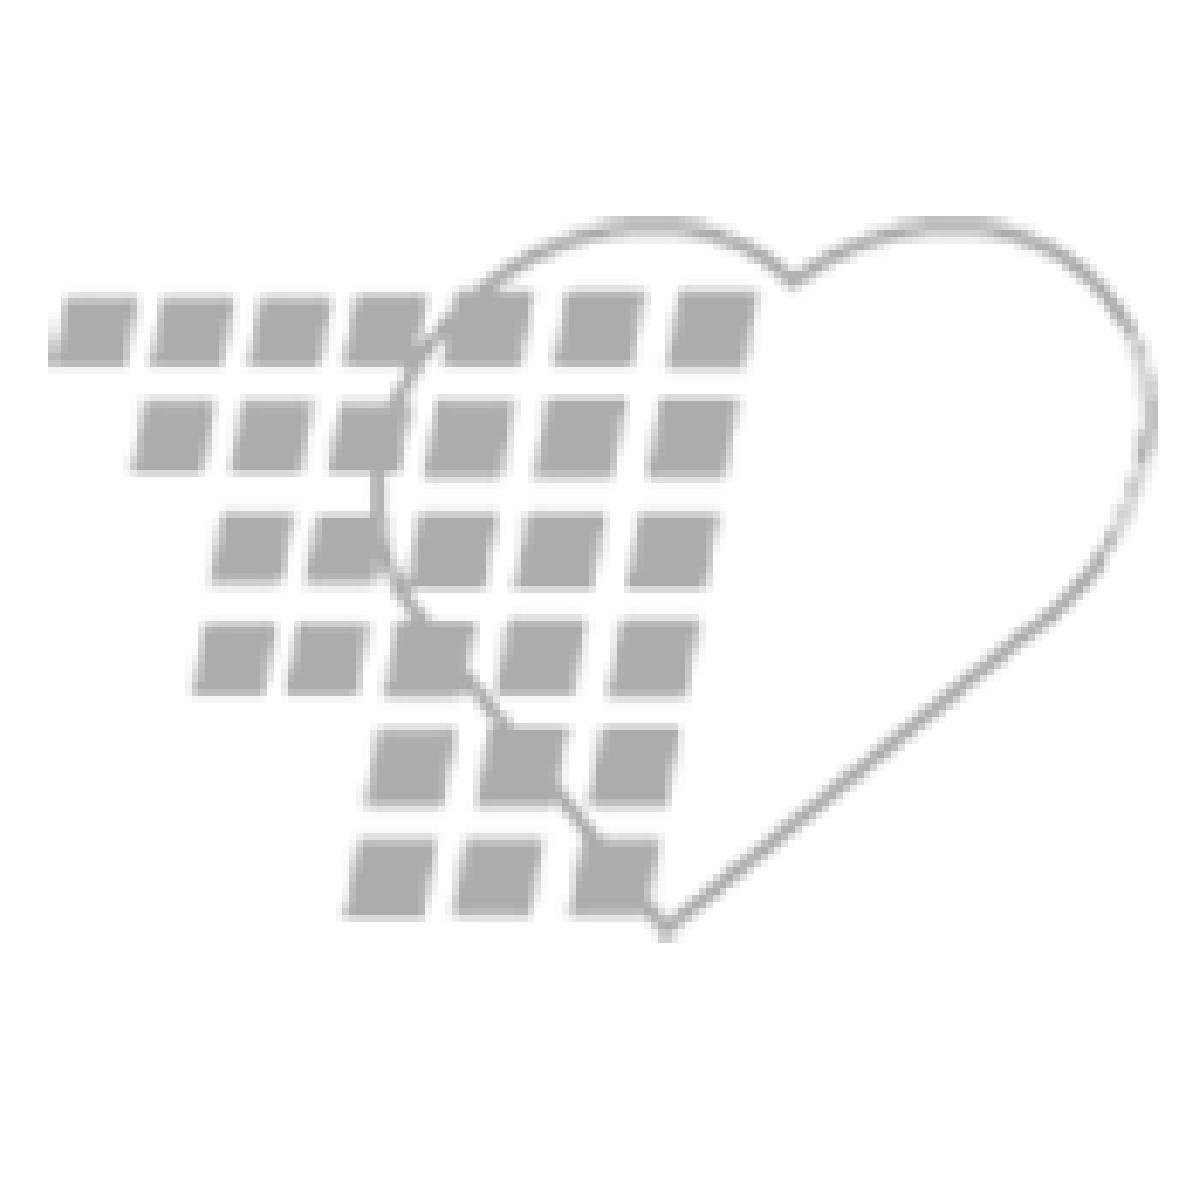 08-02-32 - BD   E-Z Scrub   Preoperative Surgical Scrub Brush 107 with 4% CHG